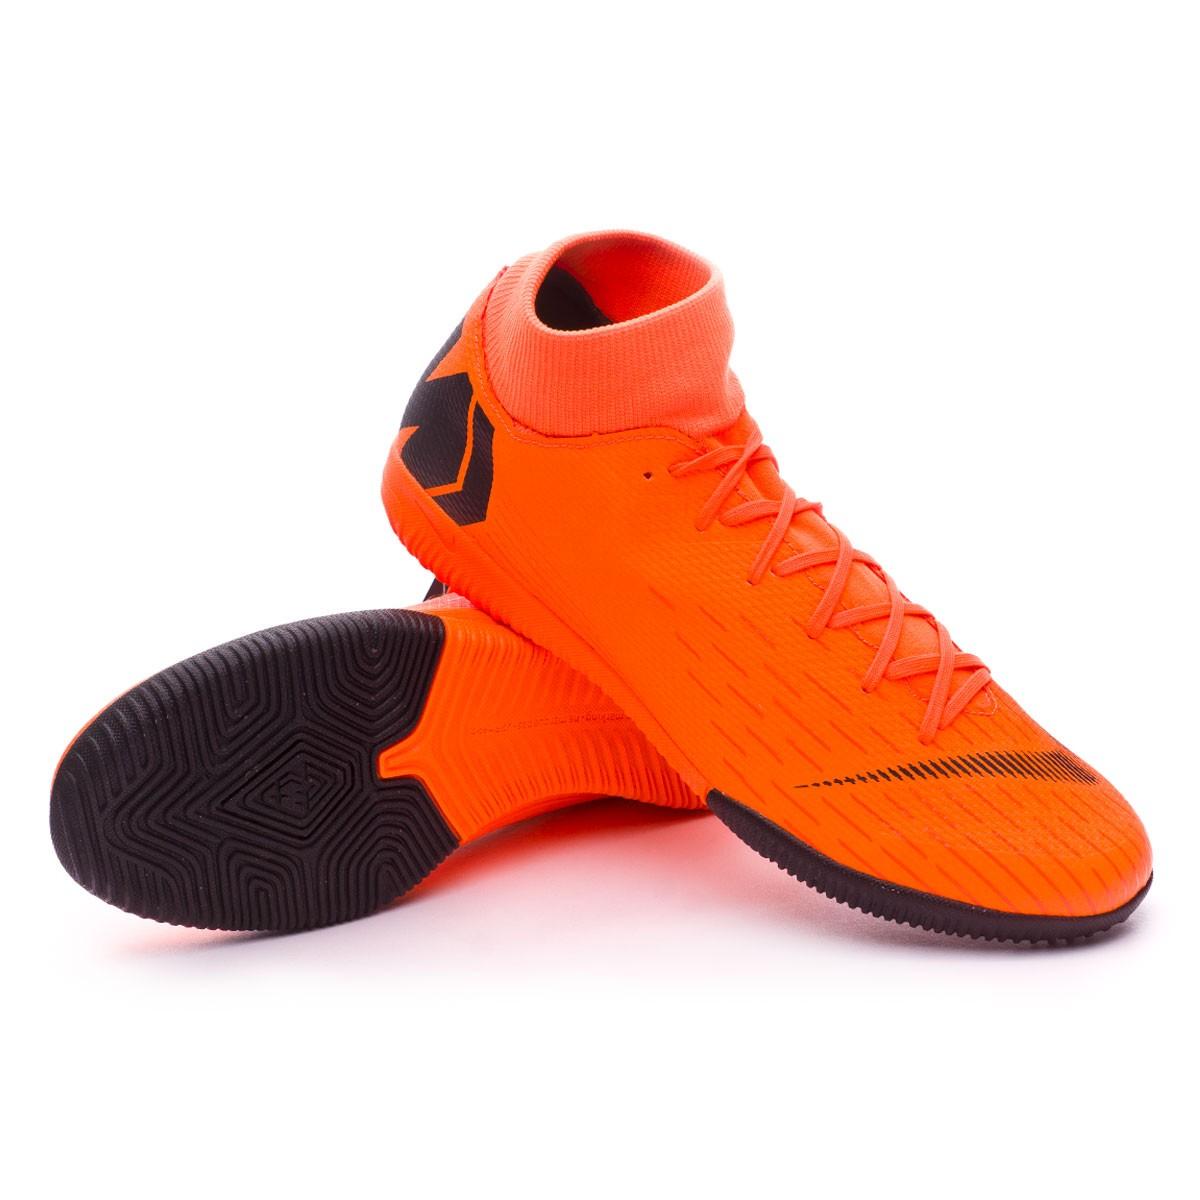 7891bc89e000 Futsal Boot Nike Mercurial SuperflyX VI Academy IC Total orange ...